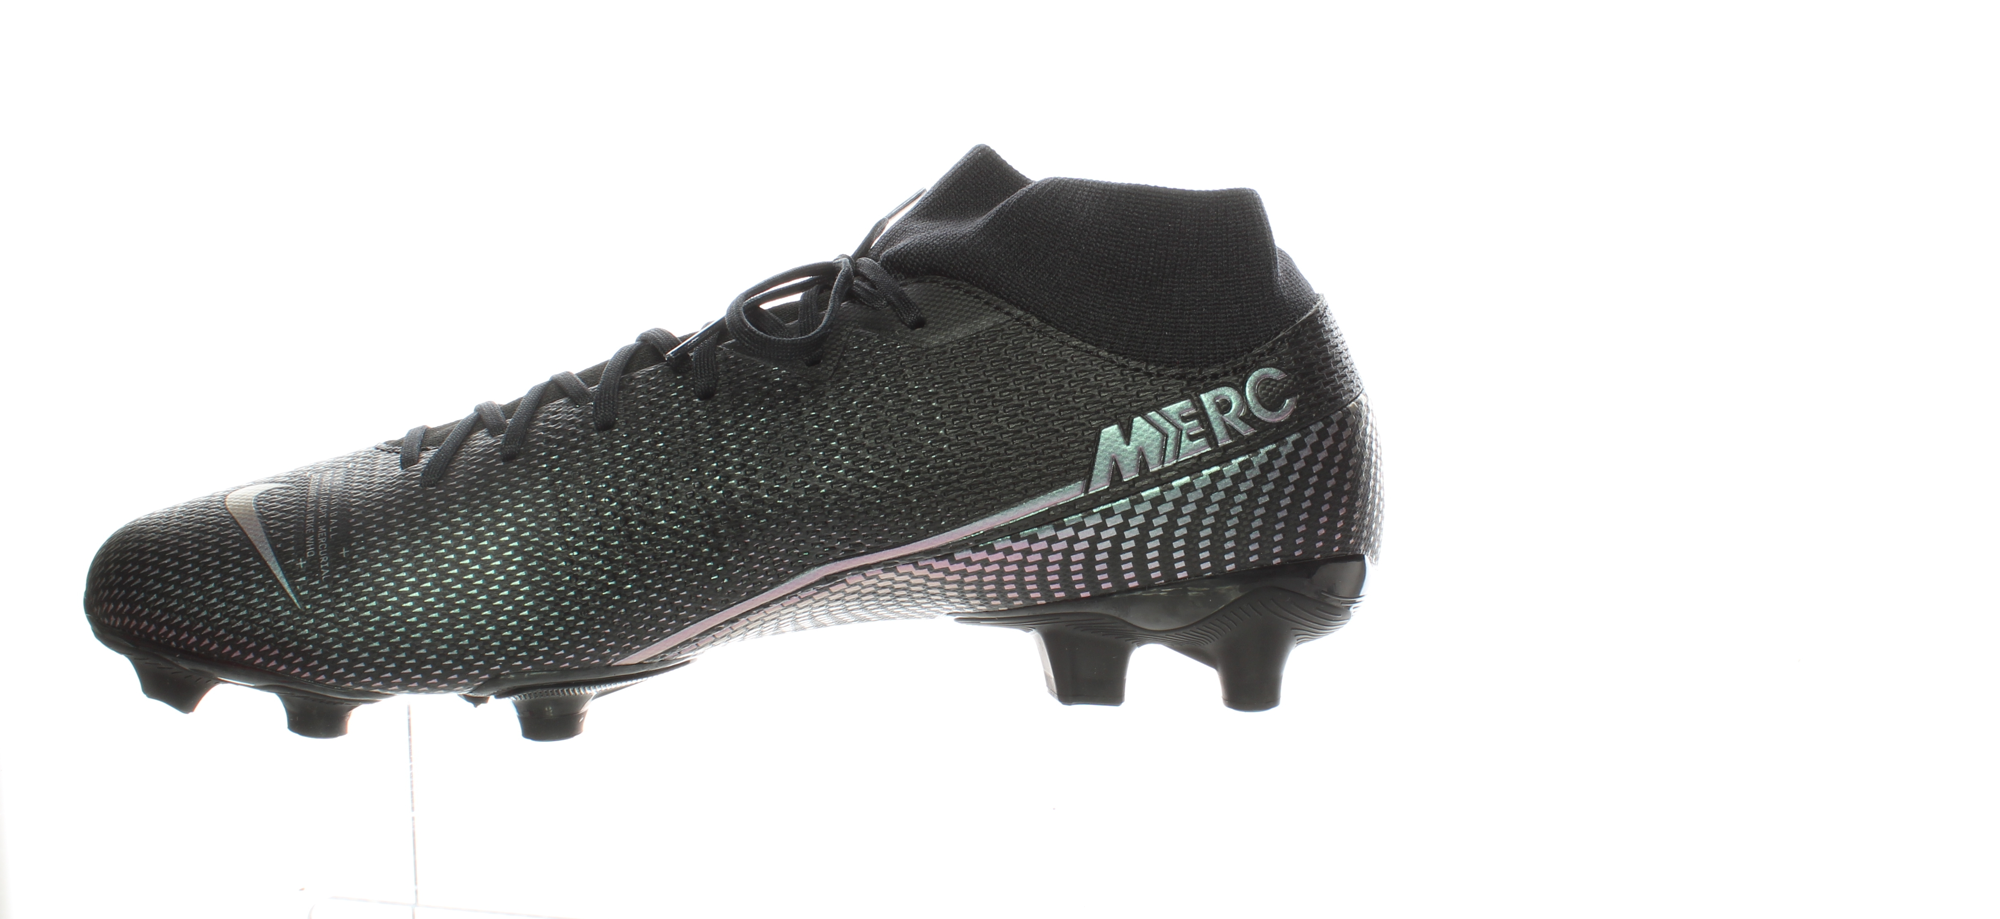 thumbnail 3 - Nike-Mens-Superfly-7-Academy-Fg-Mg-Black-Black-Football-Cleats-Size-11-1634335